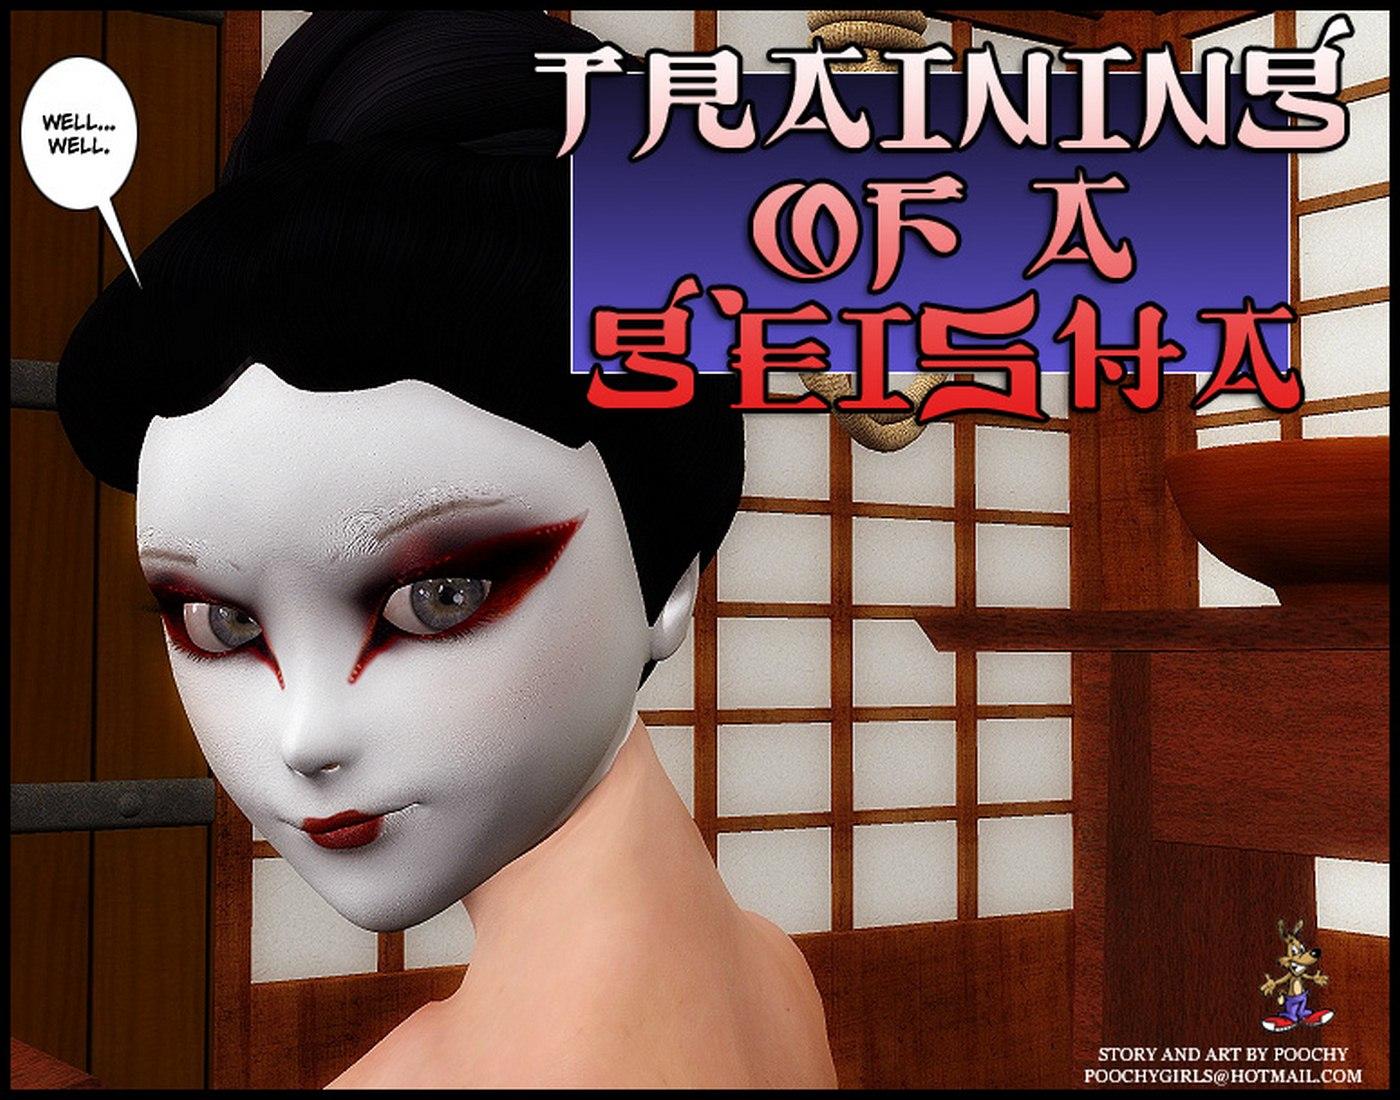 Training of a Geisha-Poochy Comix image 01